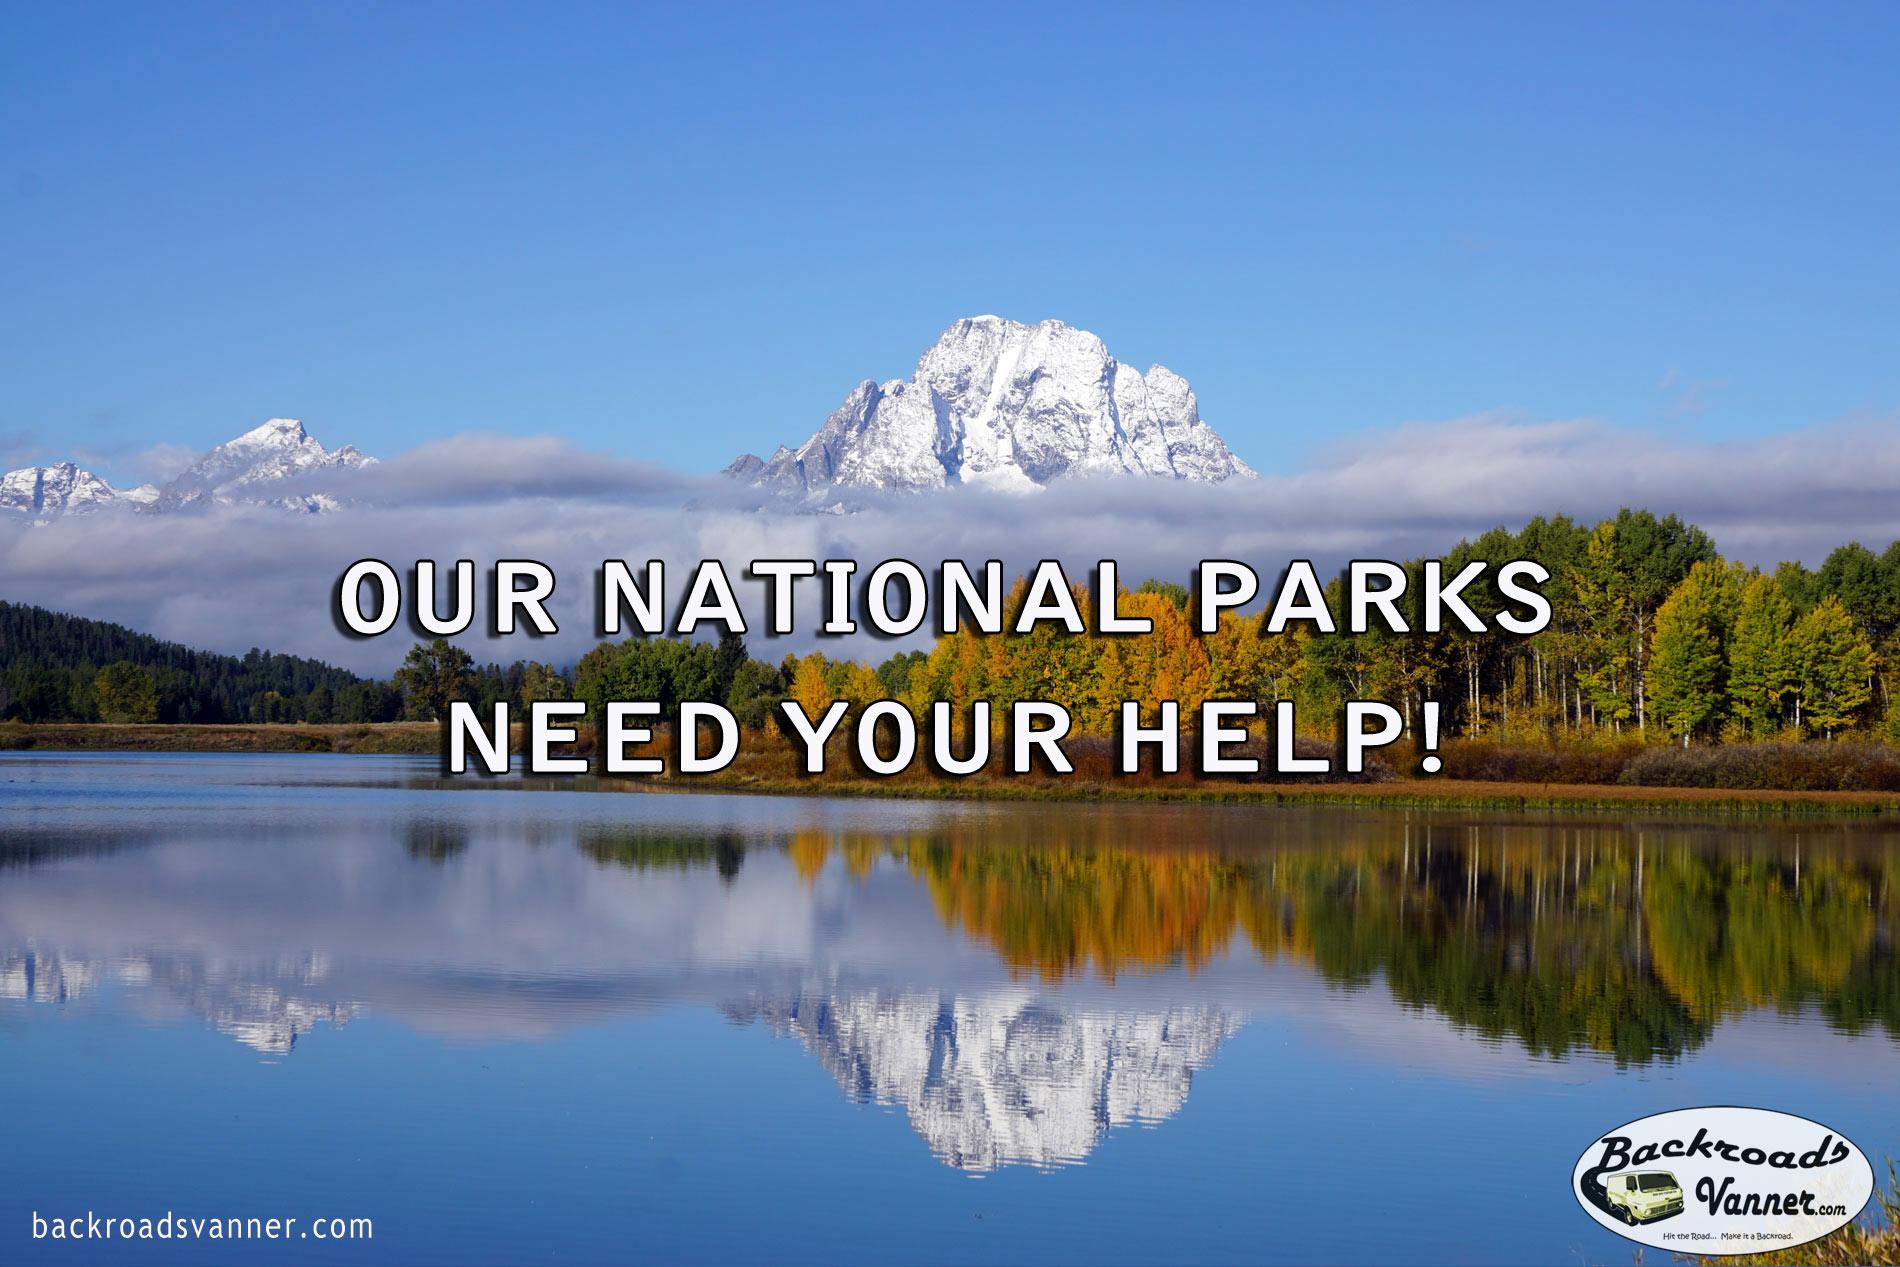 BackroadsVanner.com National Park Plea